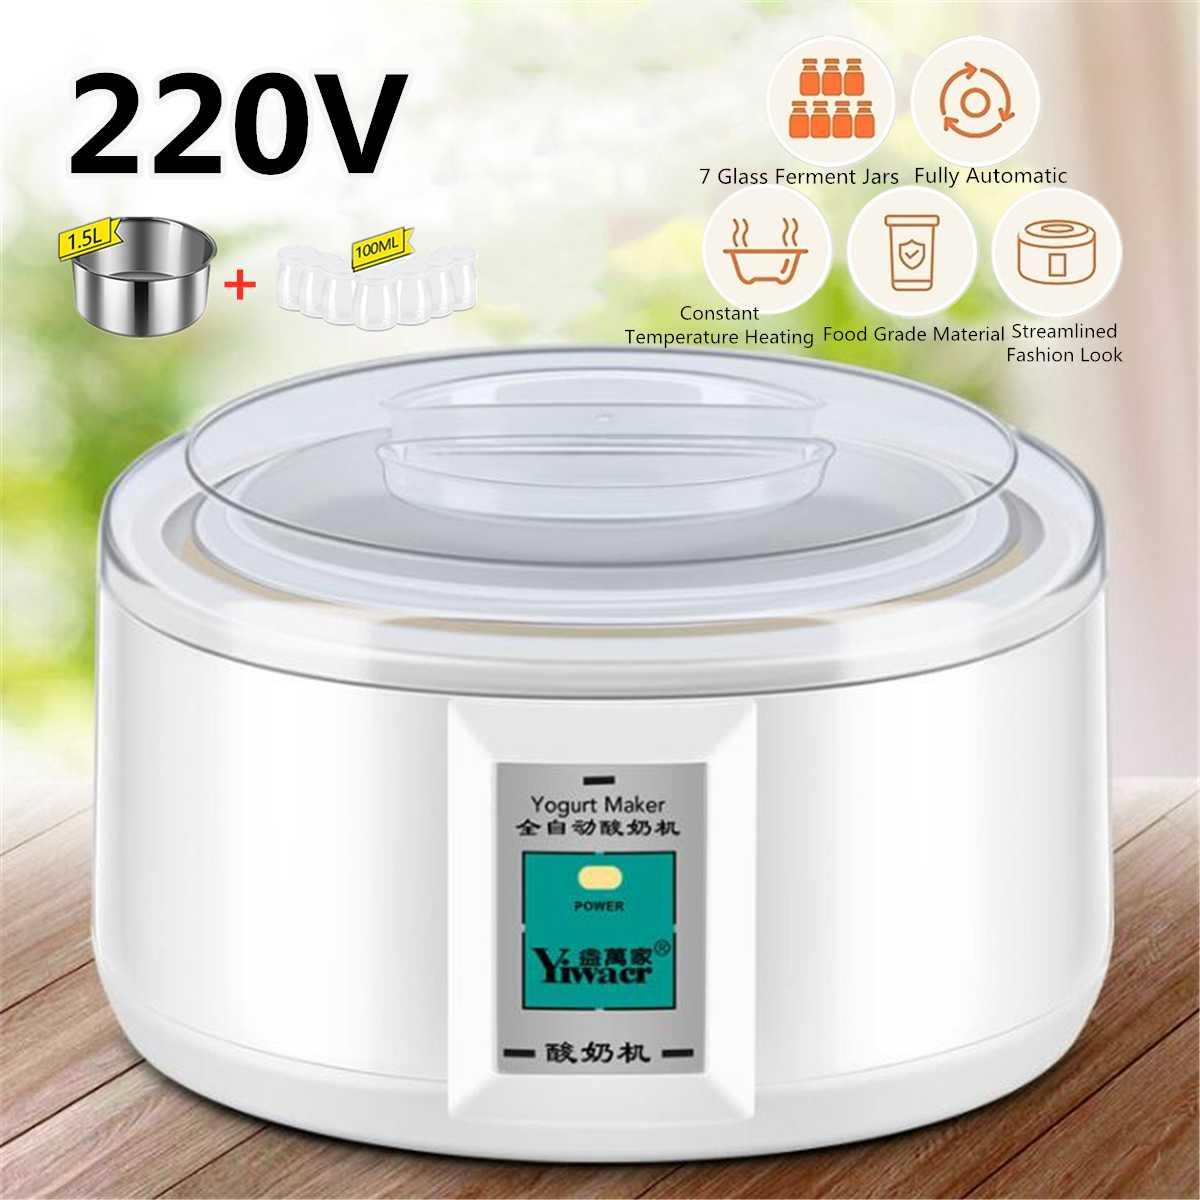 1.5L Electric Yogurt Maker Yogurt DIY Tool Kitchen Appliances Automatic Liner Material Stainless Steel Yogurt Maker with 7 Jars